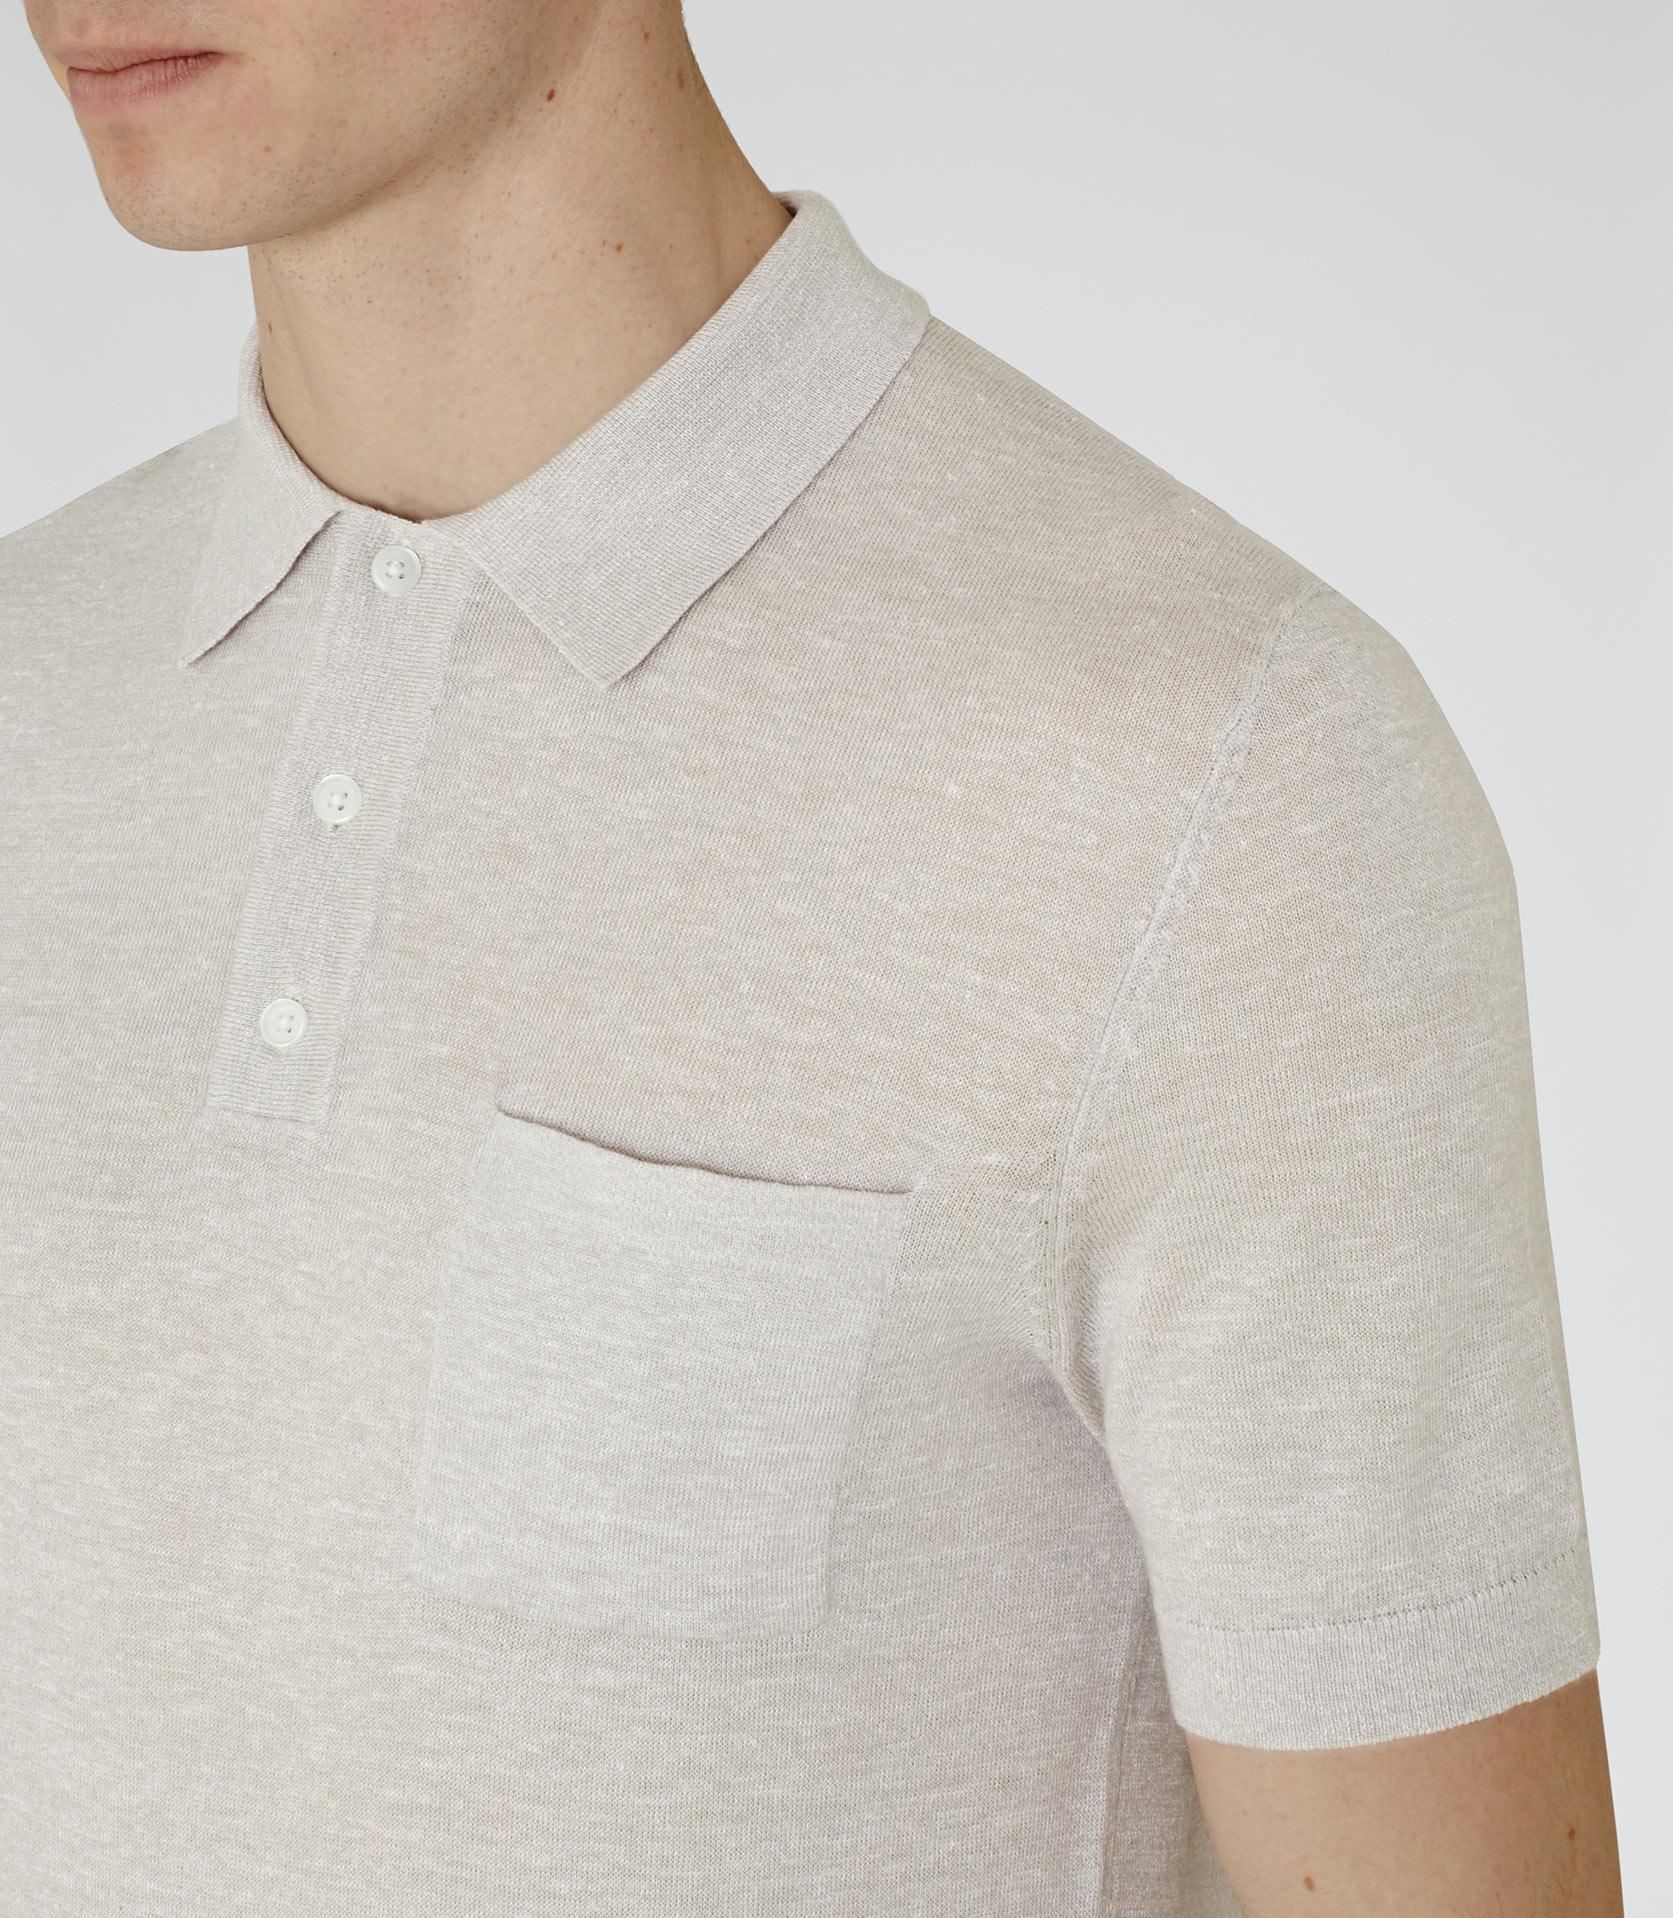 Lyst Reiss Hendrick Wool And Linen Polo Shirt In White For Men